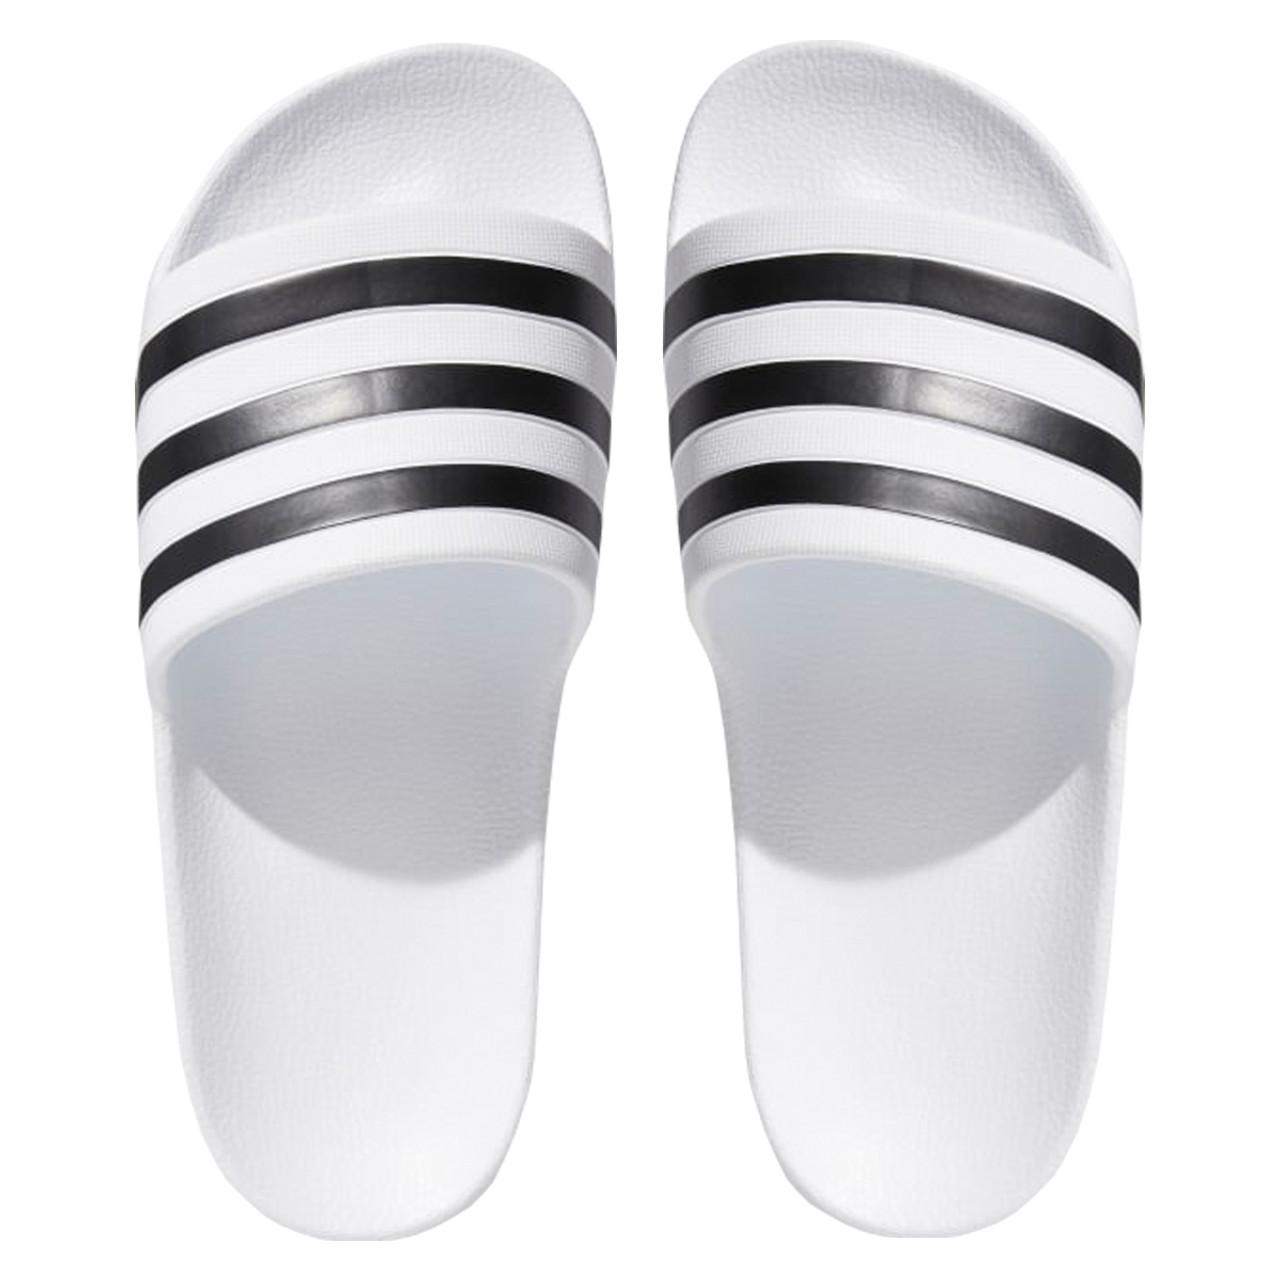 40ddce34e Adidas Adilette Aqua Women's Sandals G28719 - White, Black